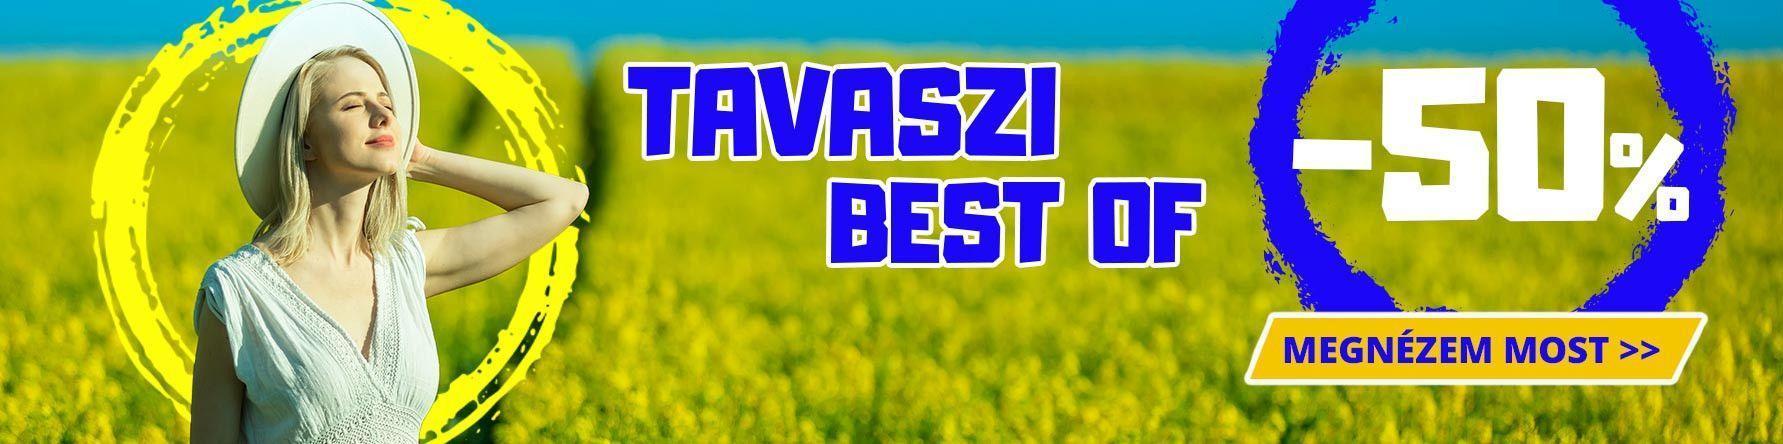 TAVASZI BEST OF